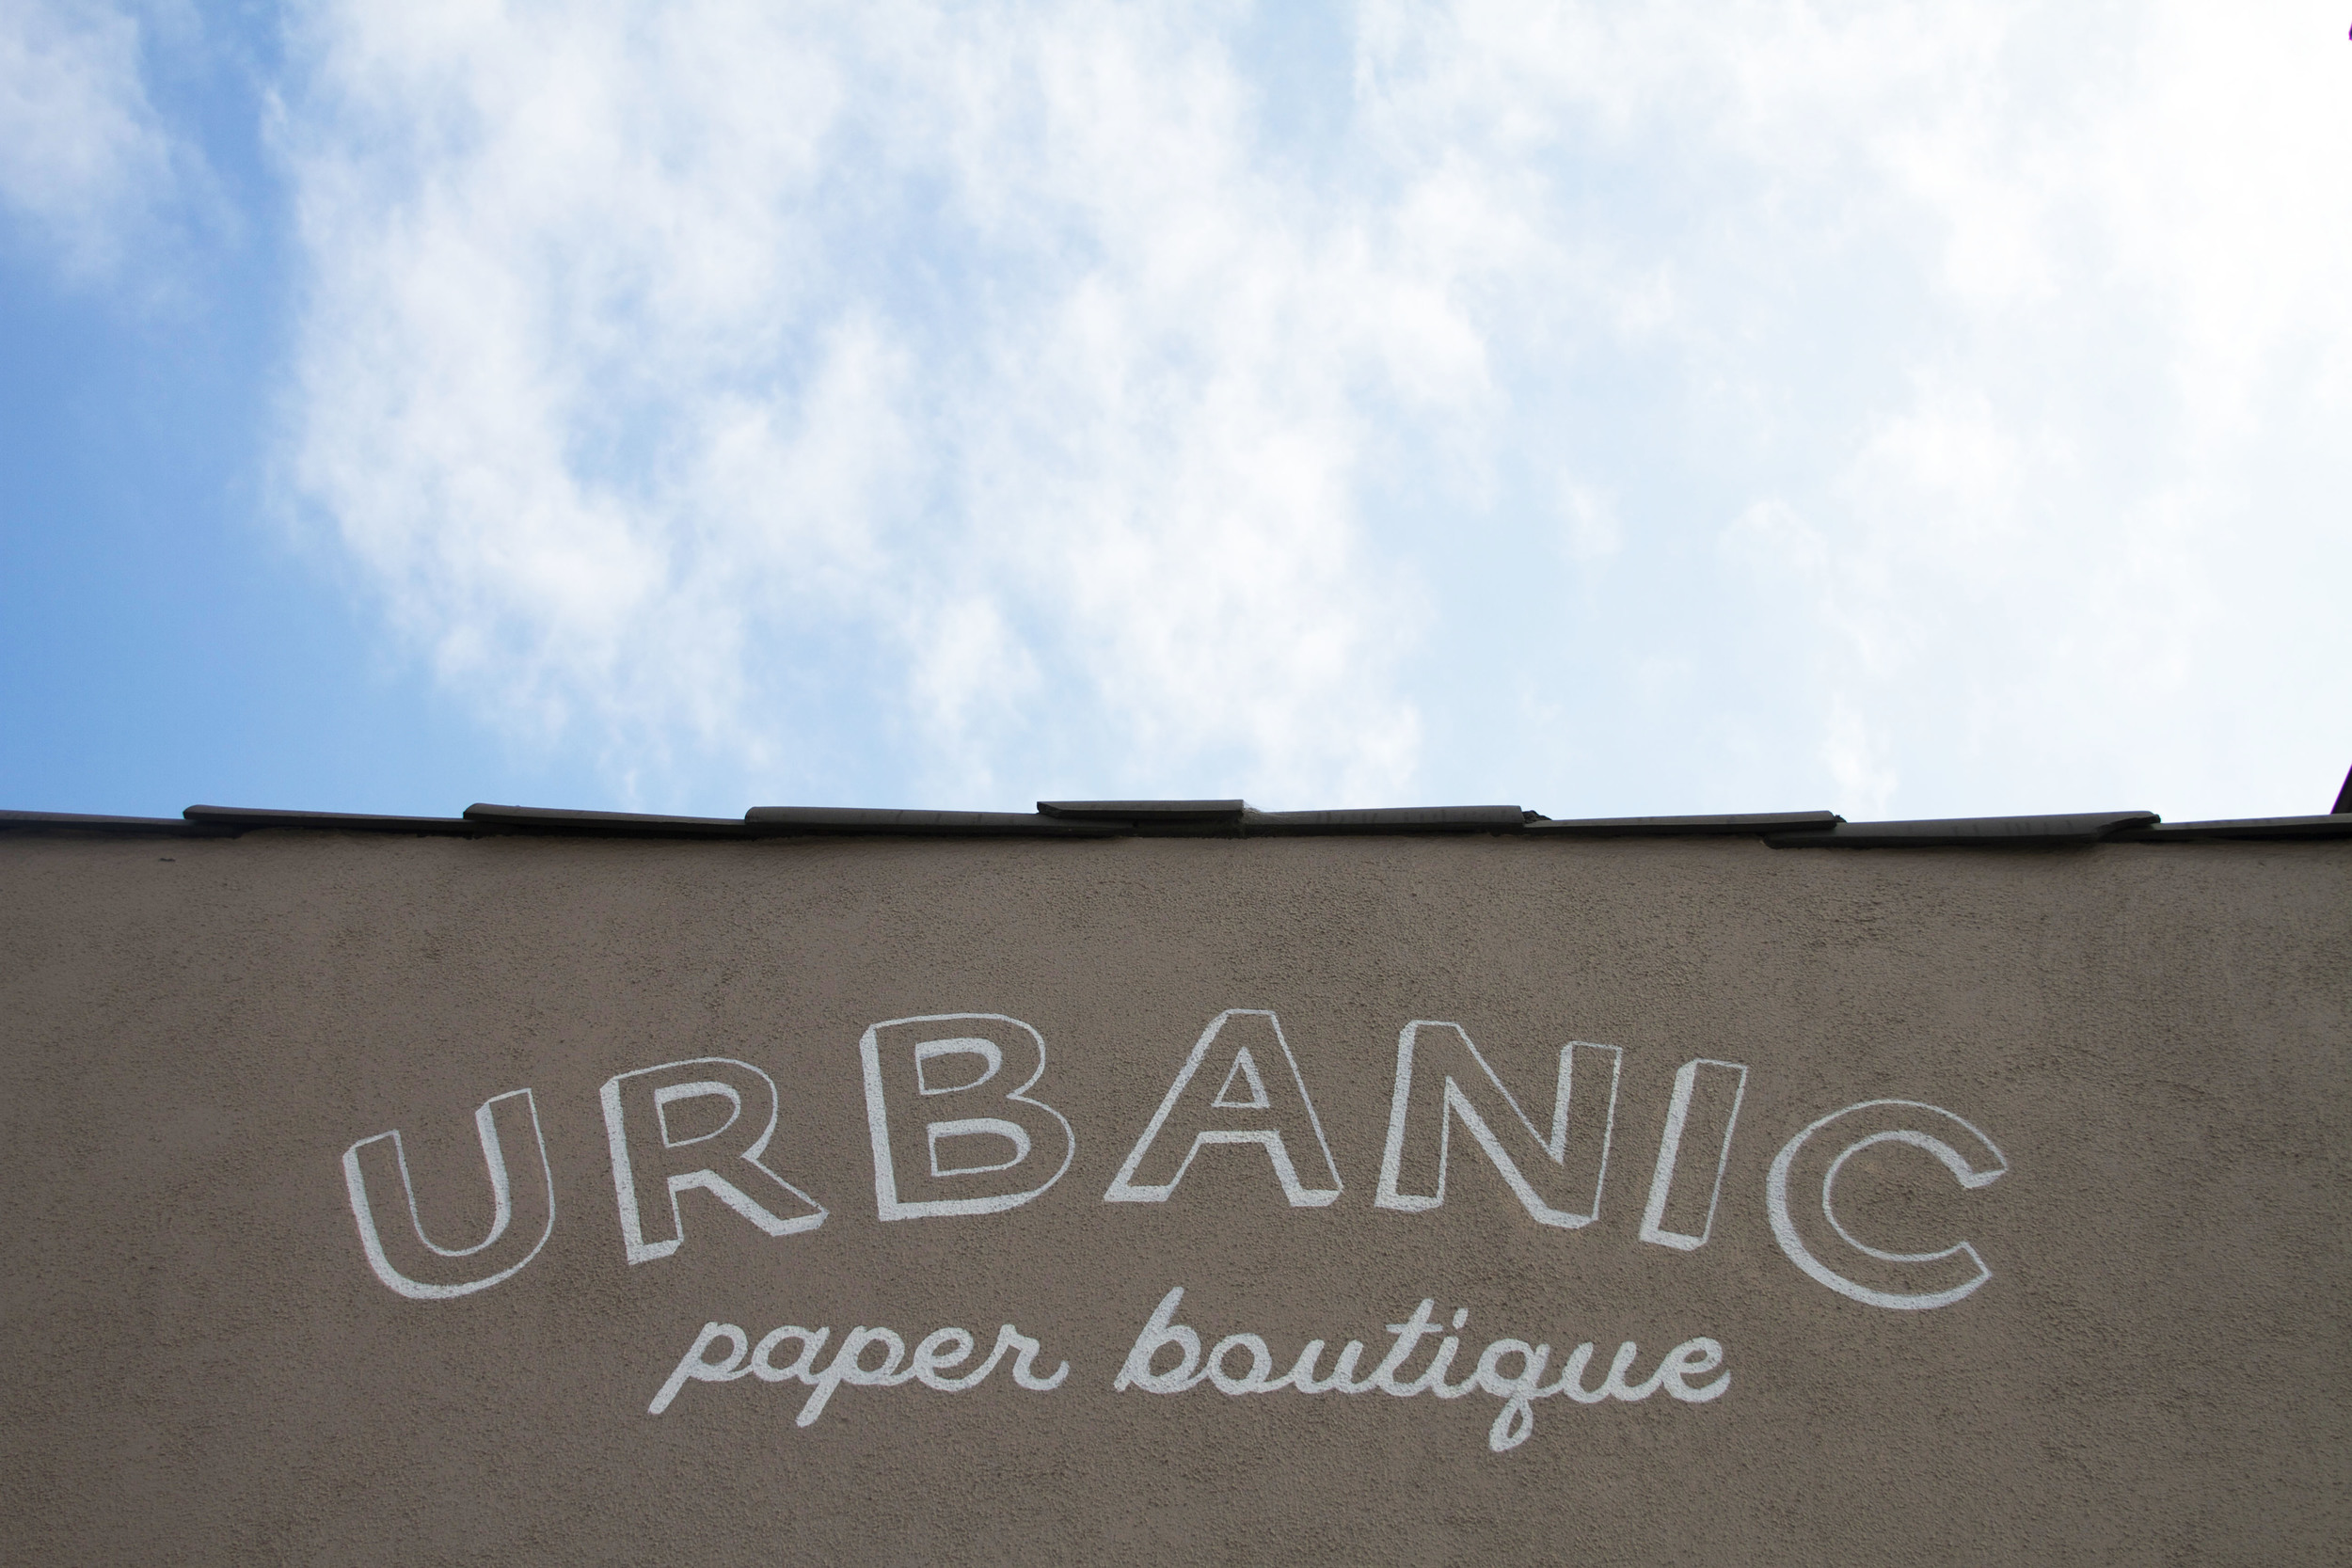 urbanic sign.jpg